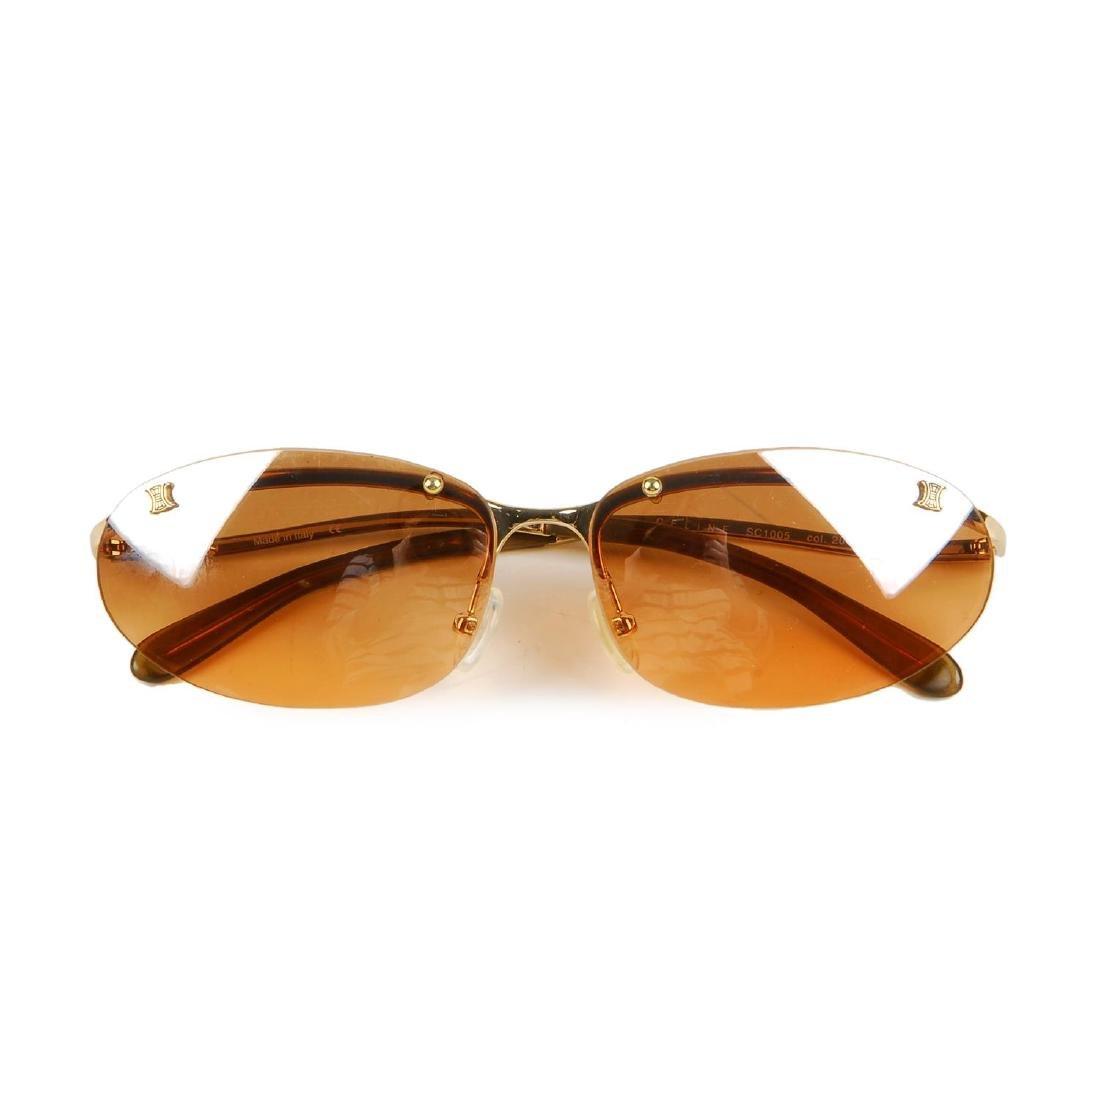 CÉLINE - a pair of rimless sunglasses. Designed with